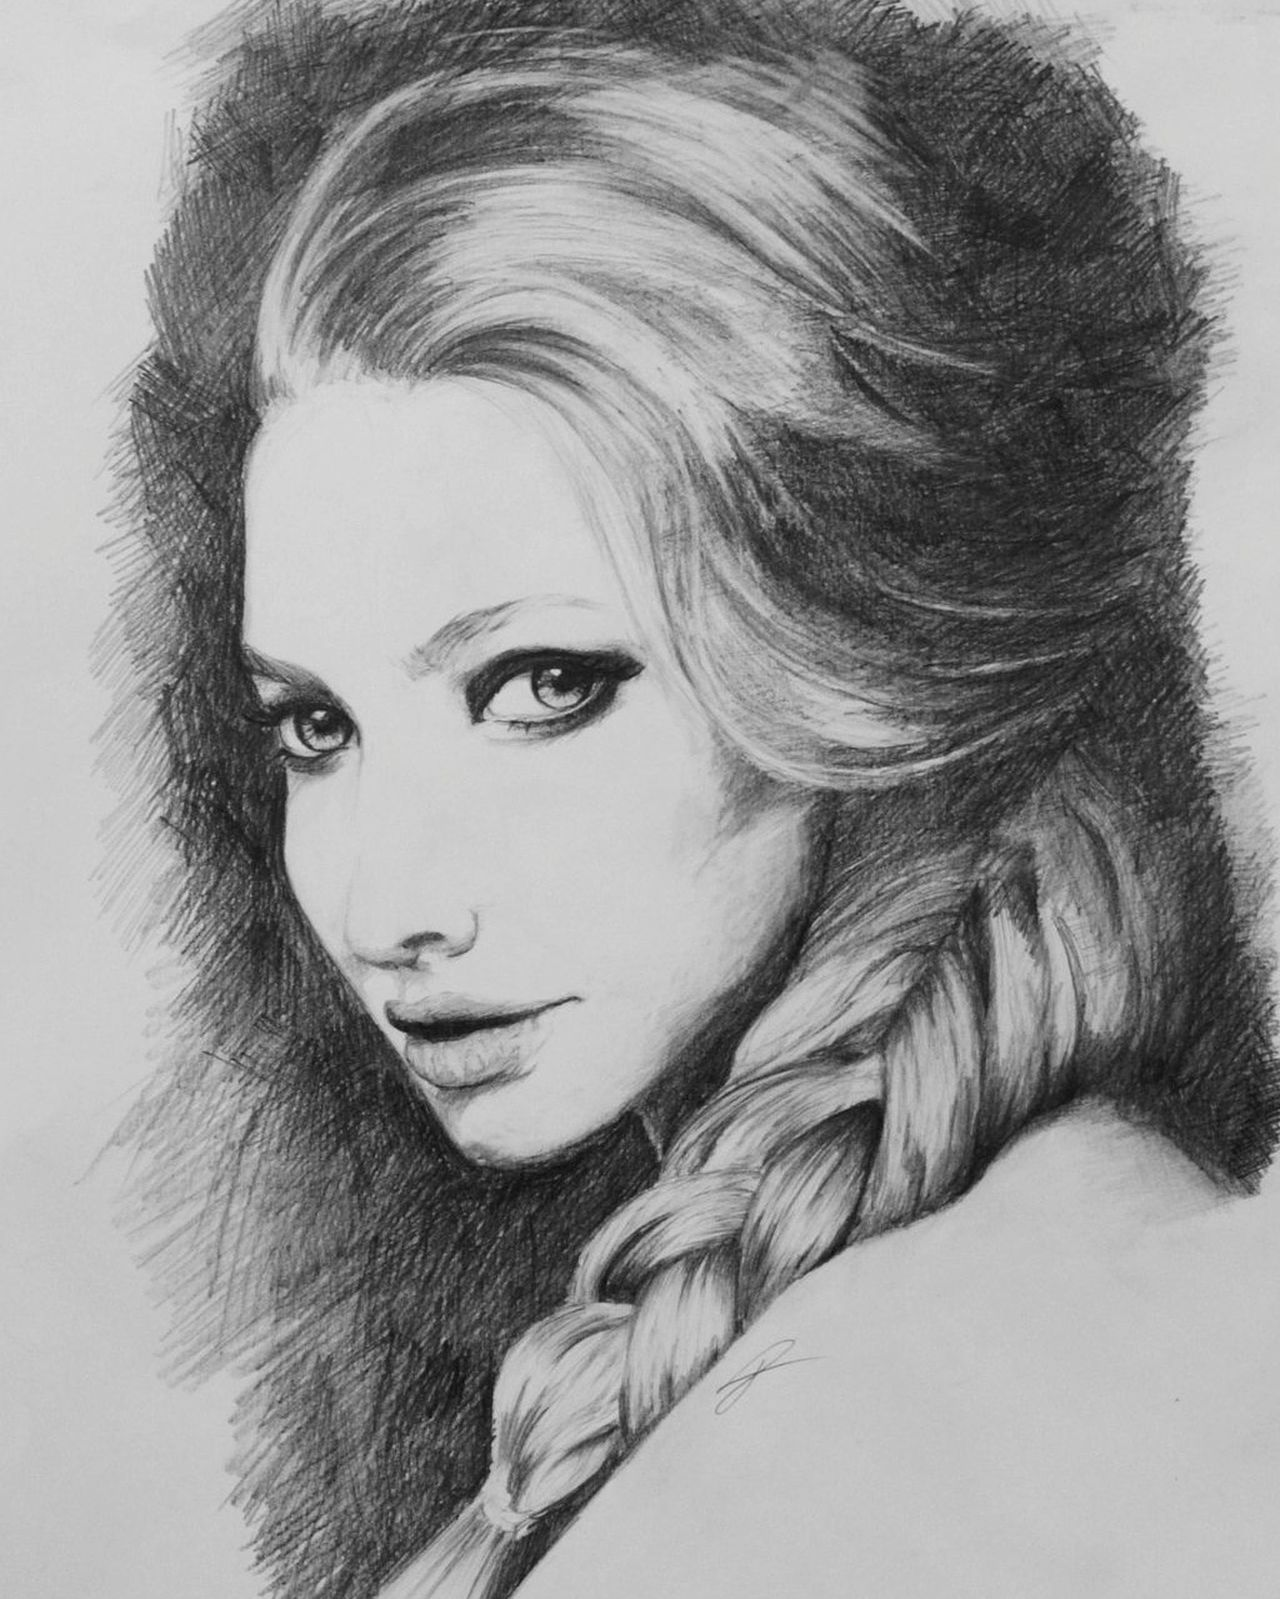 Beauty Women Portrait Beautiful People Drawing, Painting, Artwork Drawing ✏ Drawings Drawing EyeEmNewHere Art ArtWork GraphitePencil People Graphite Drawing AmandaSeyfried